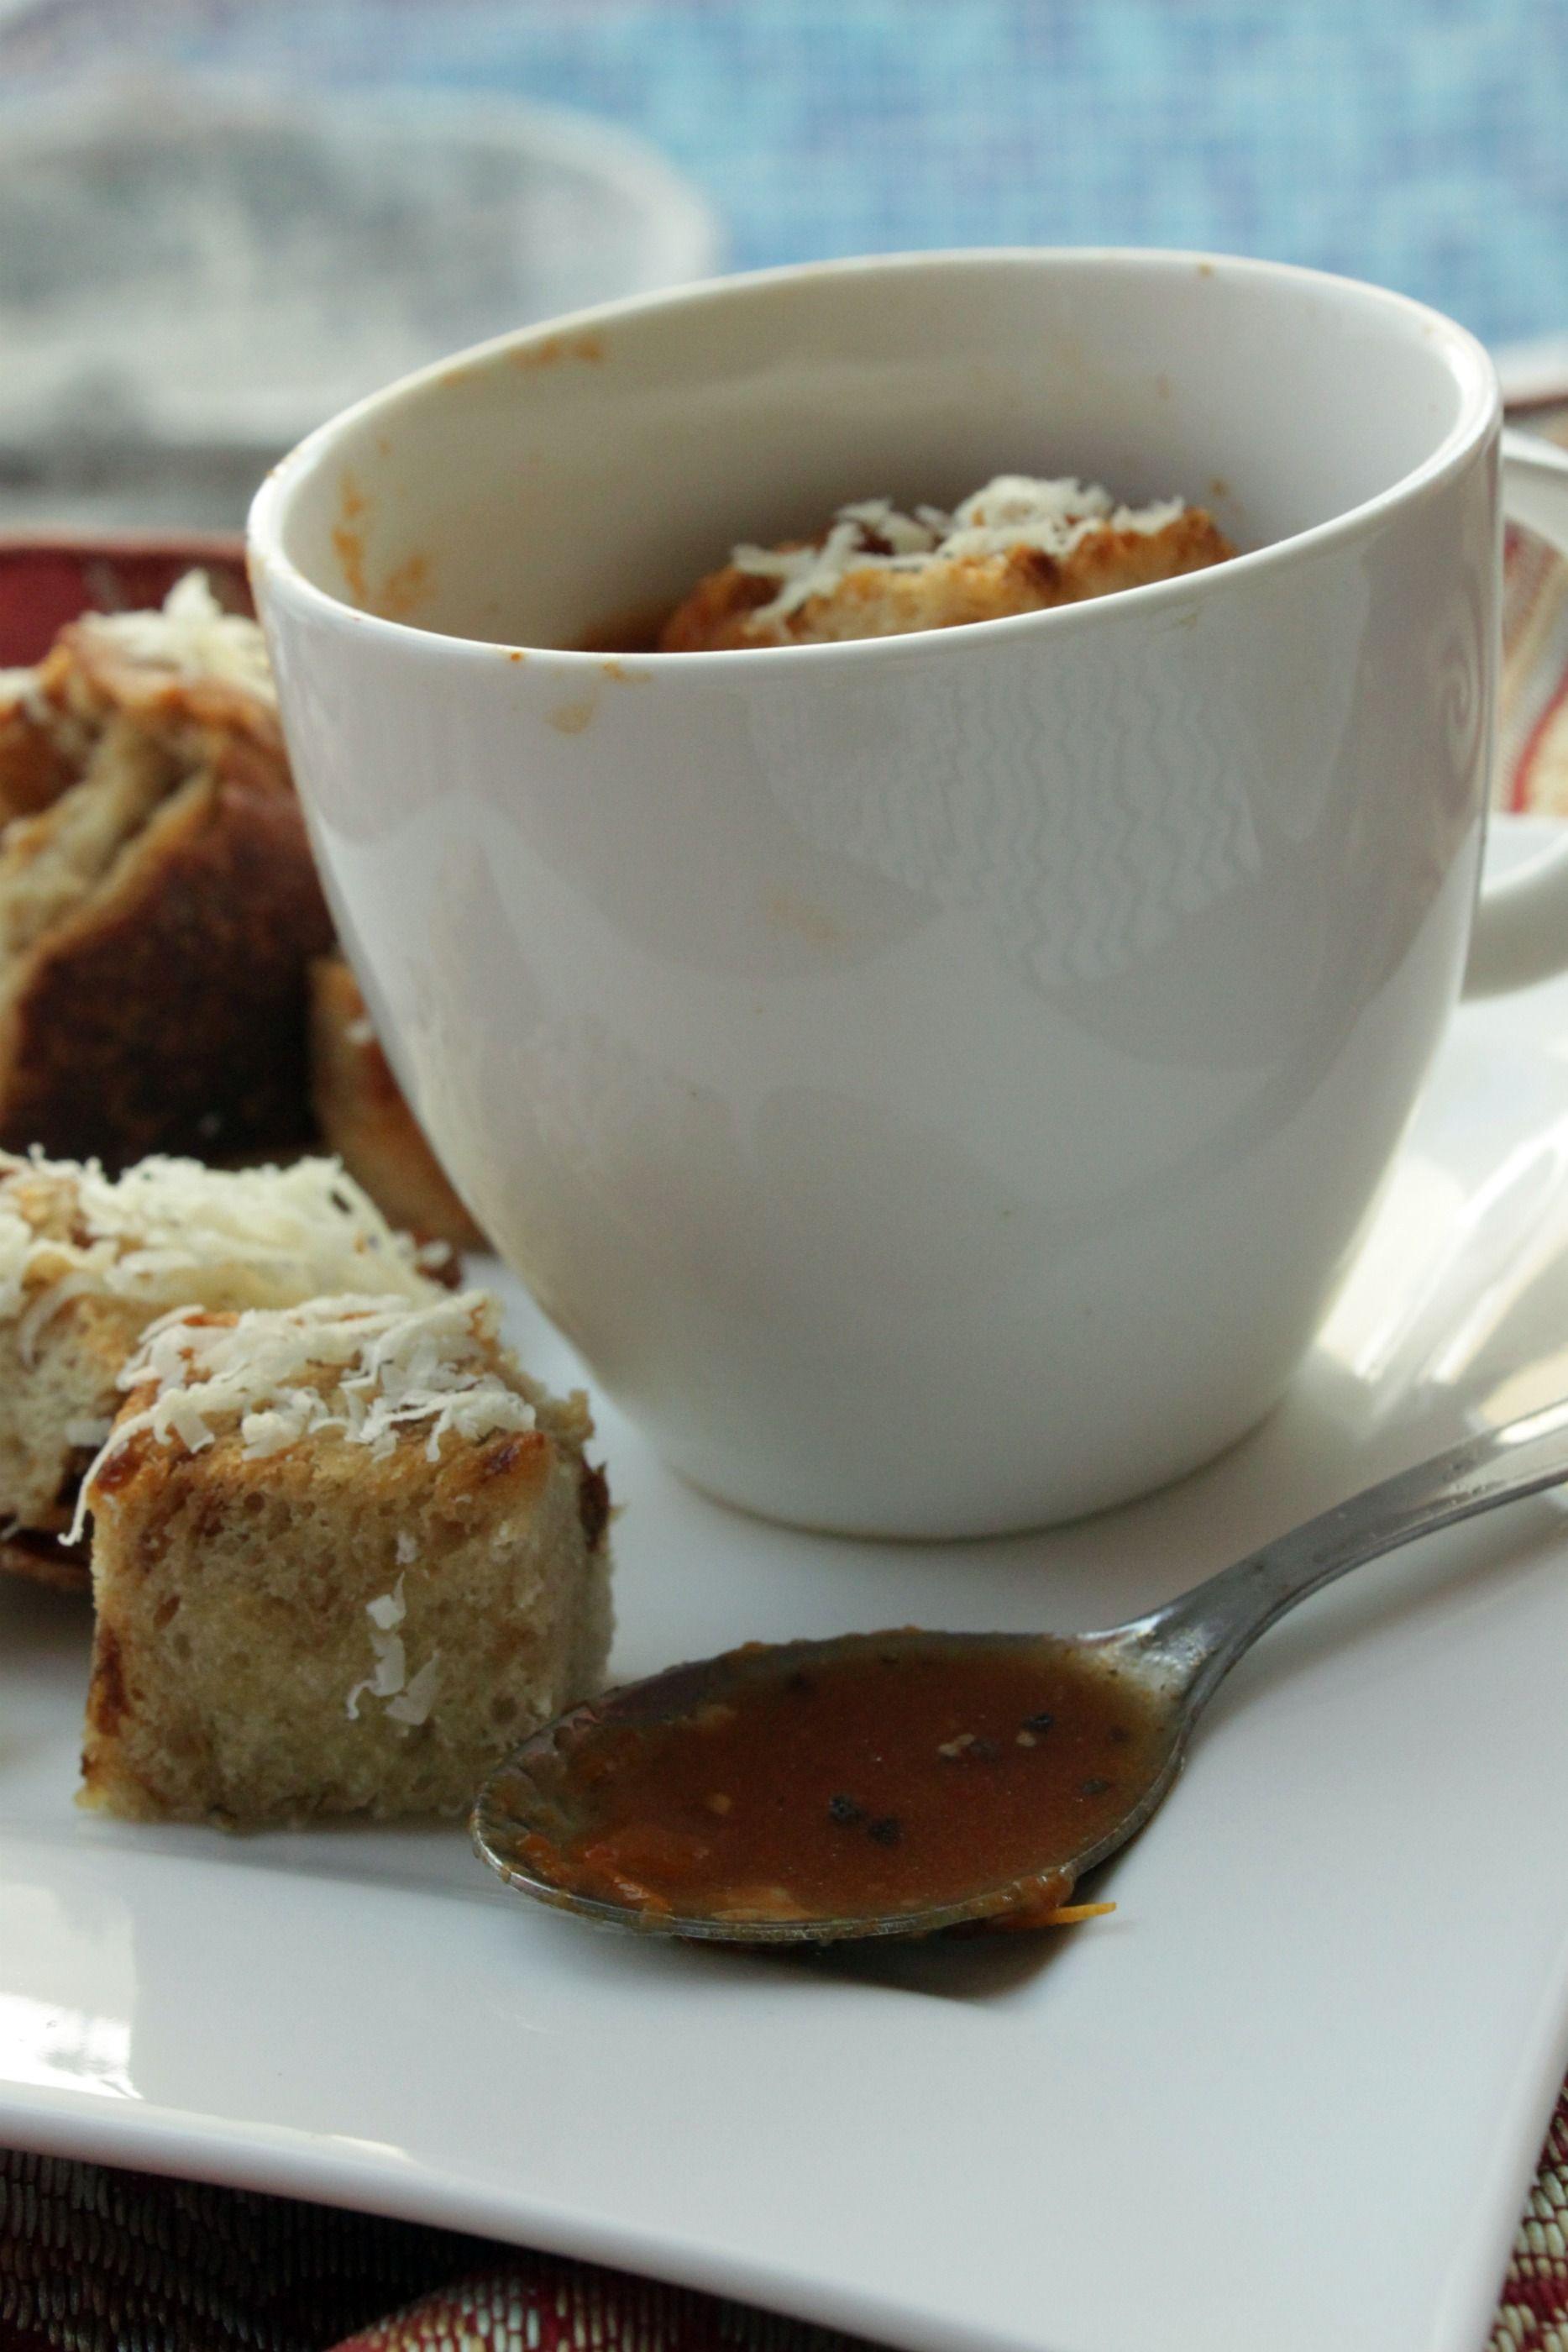 Make-Ahead Mondays: Roasted Tomato Soup w/ Caramelized Onion & Parmesan Croutons